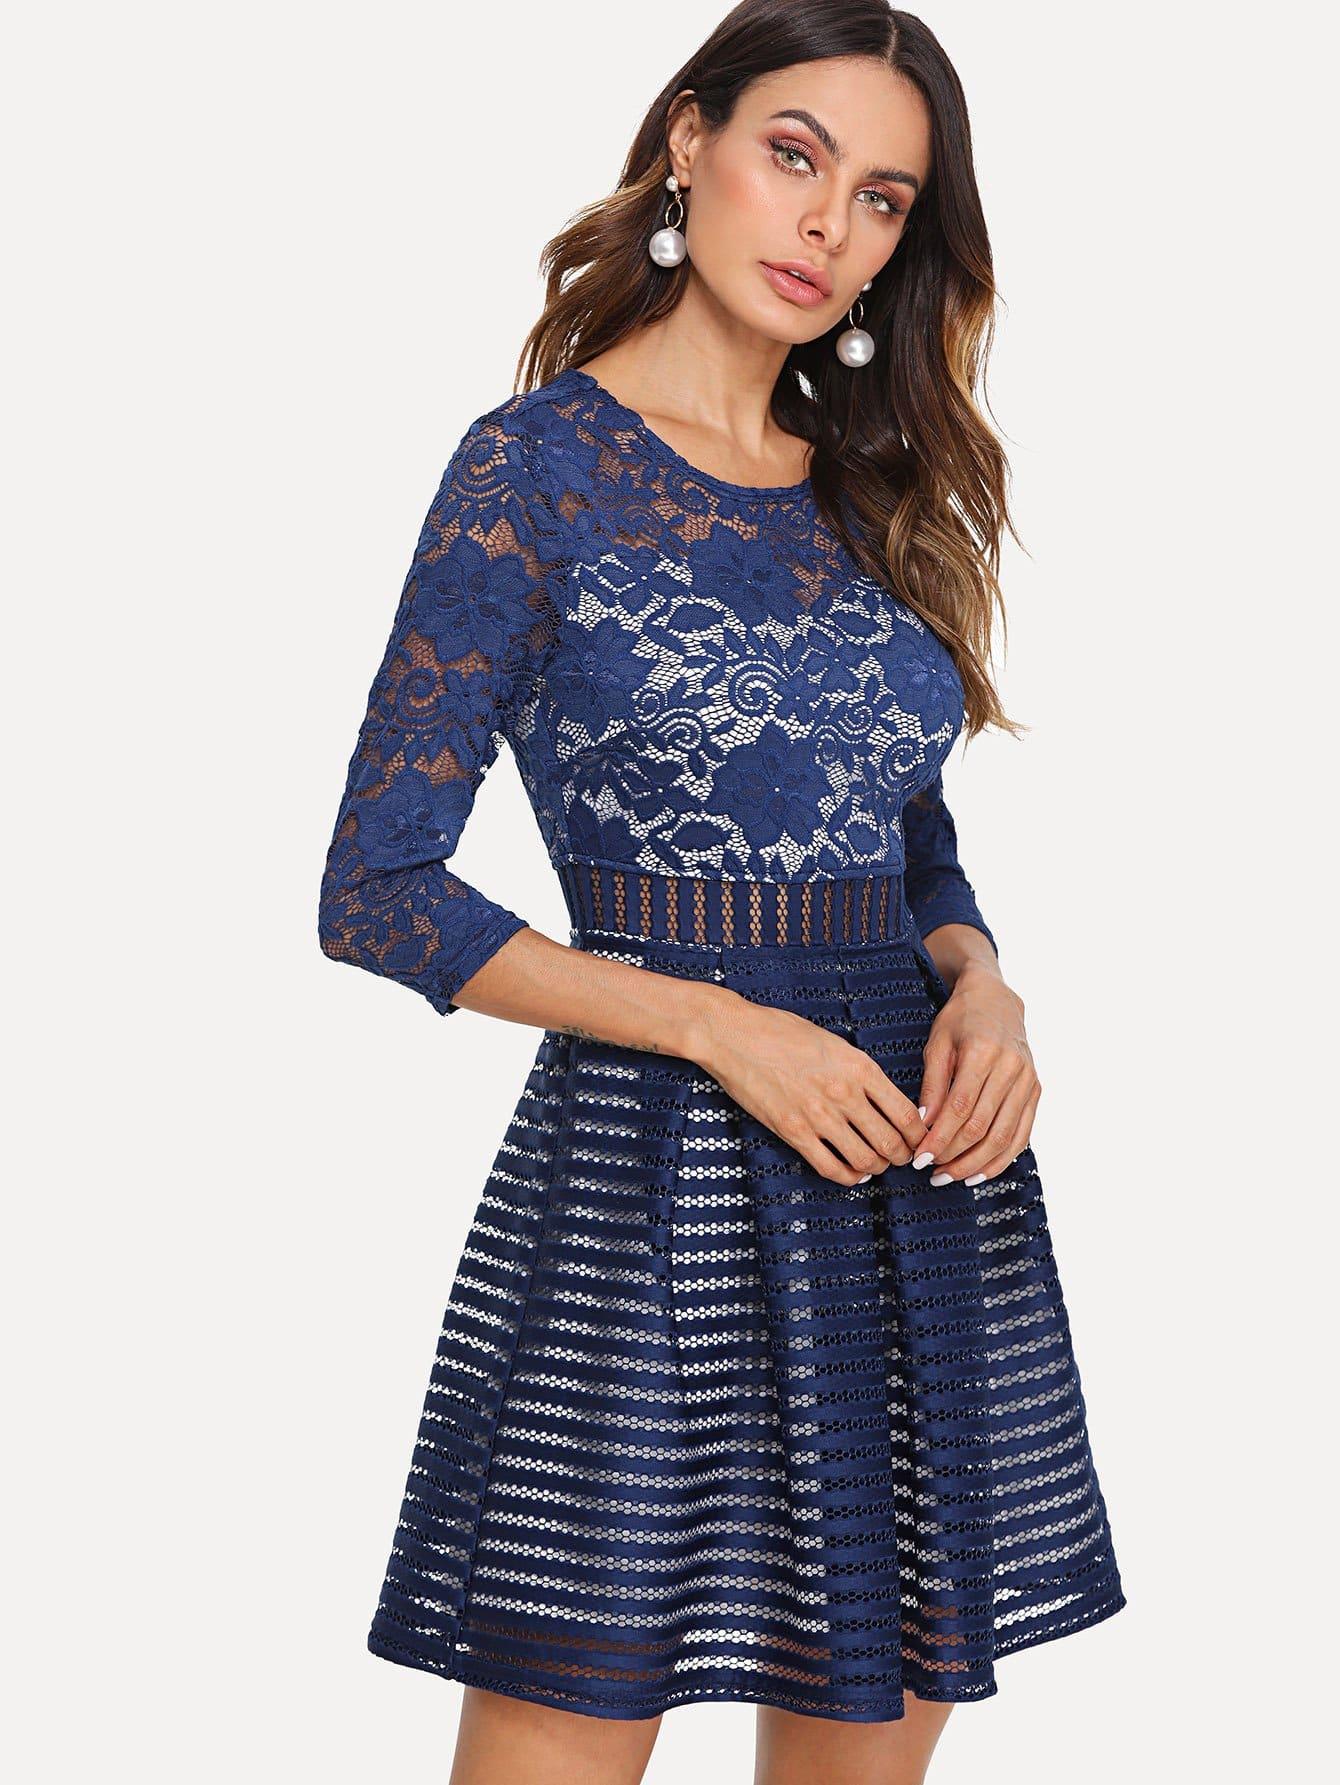 Box Pleated Lace & Mesh Skater Dress contrast mesh box pleated plain dress